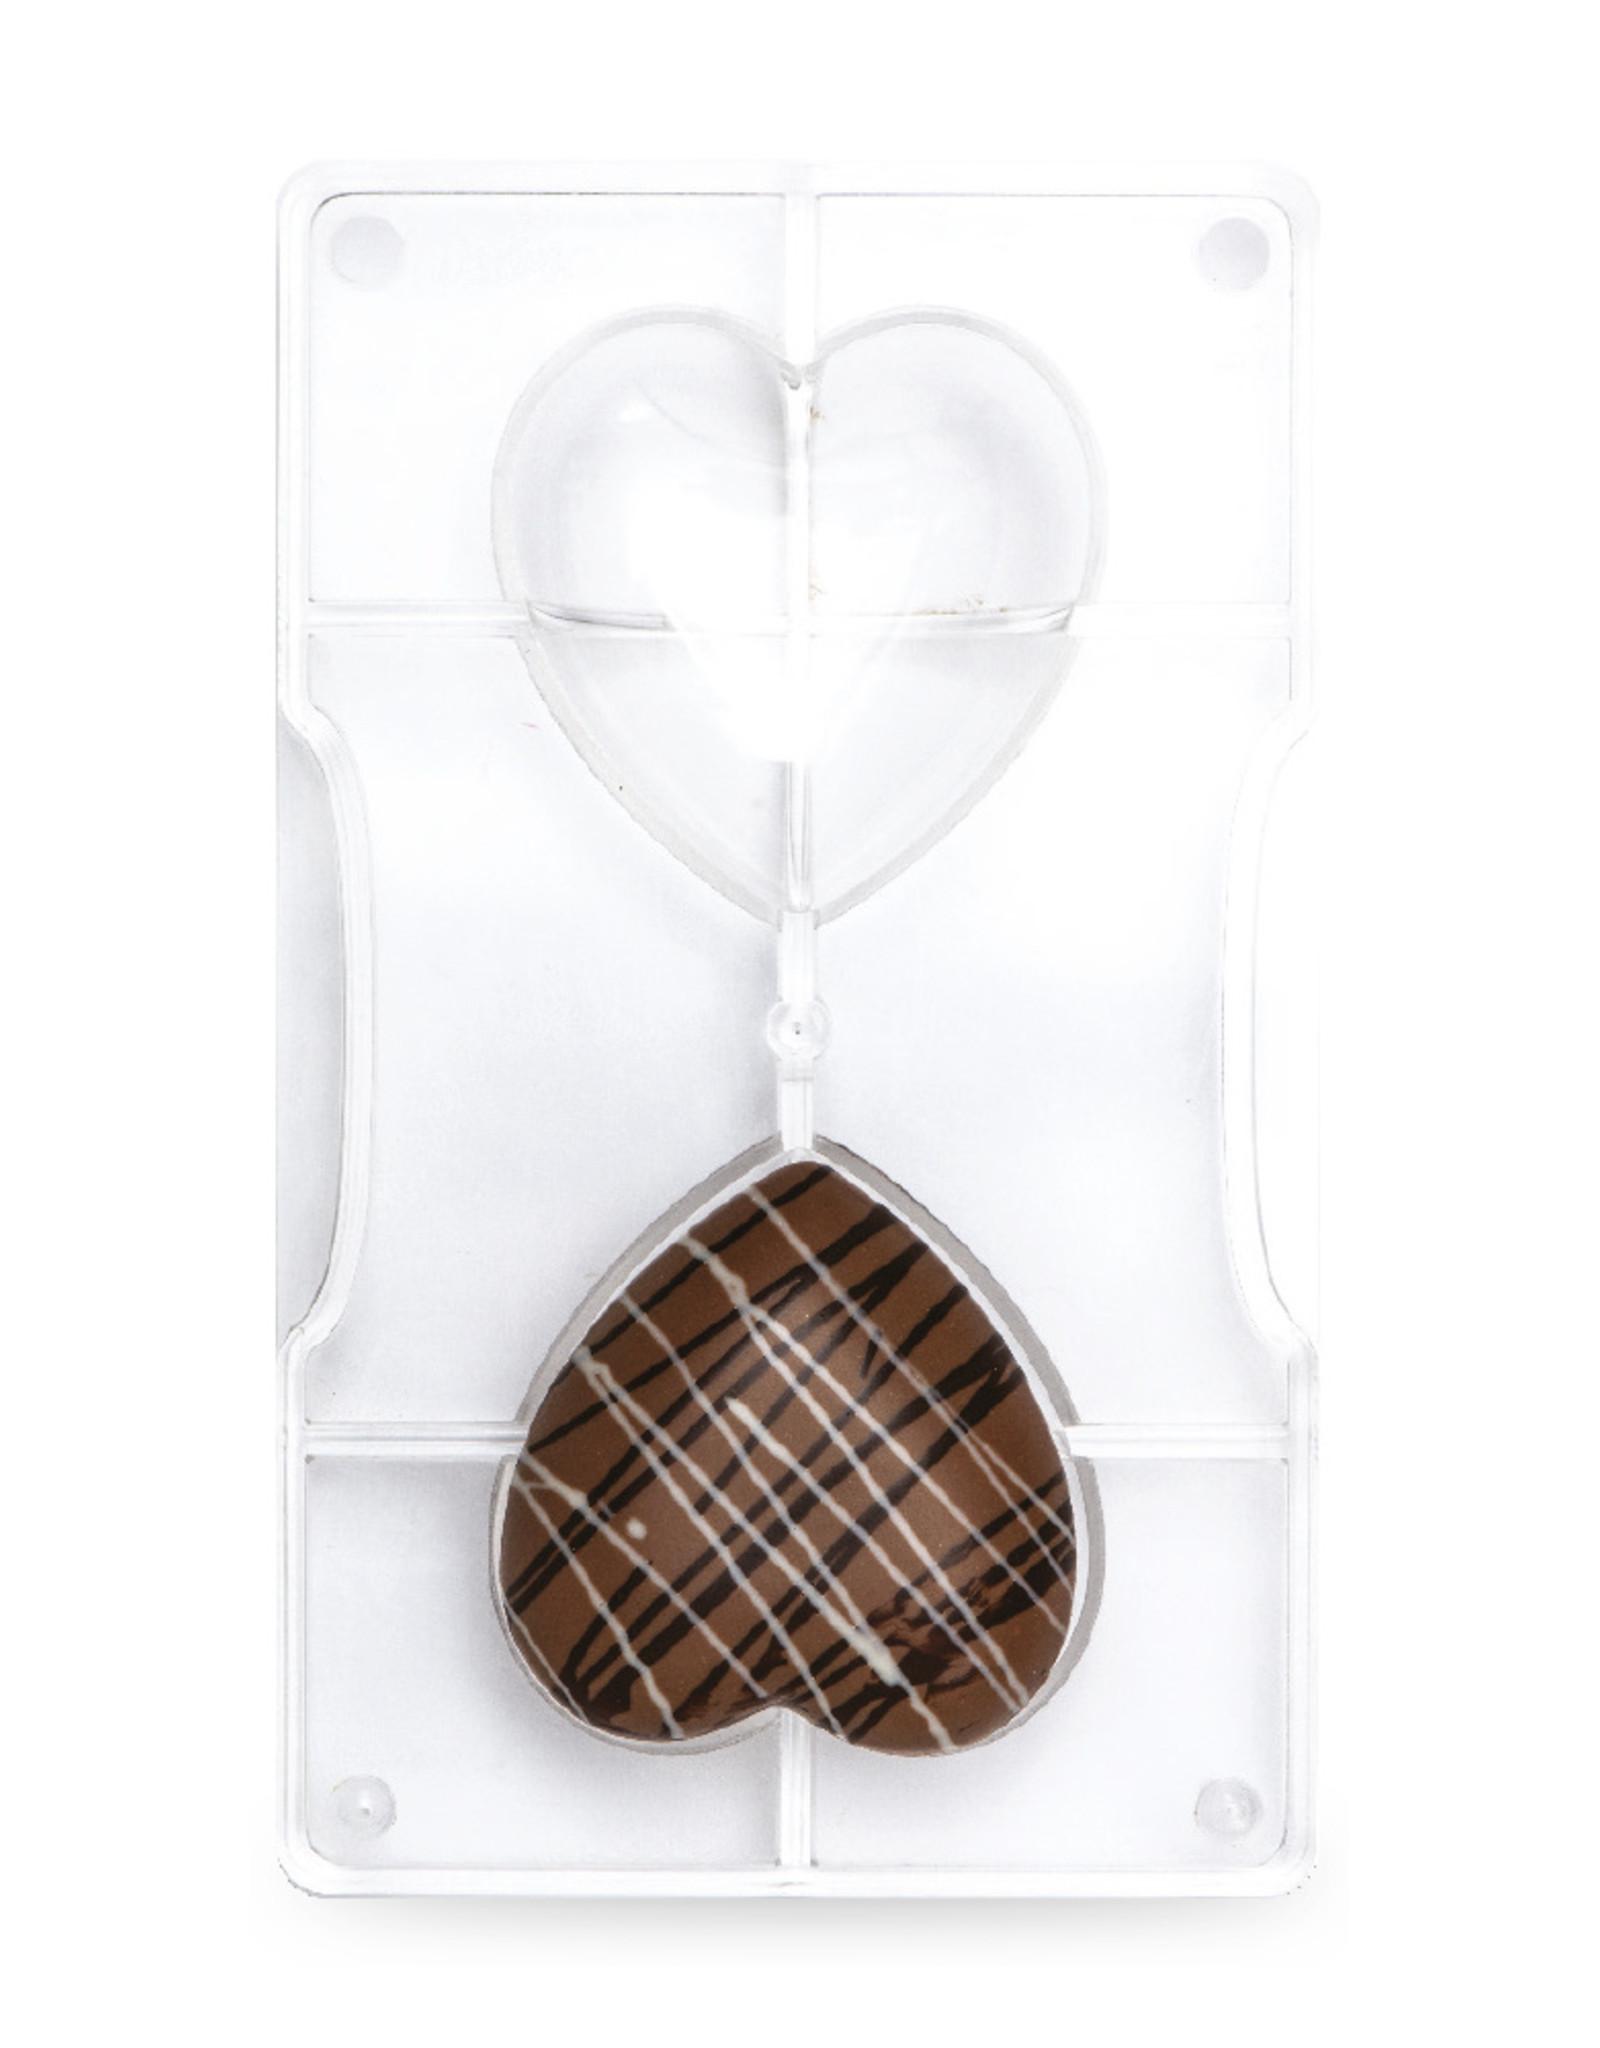 Decora Decora Chocolate Mould Hartvorm/2